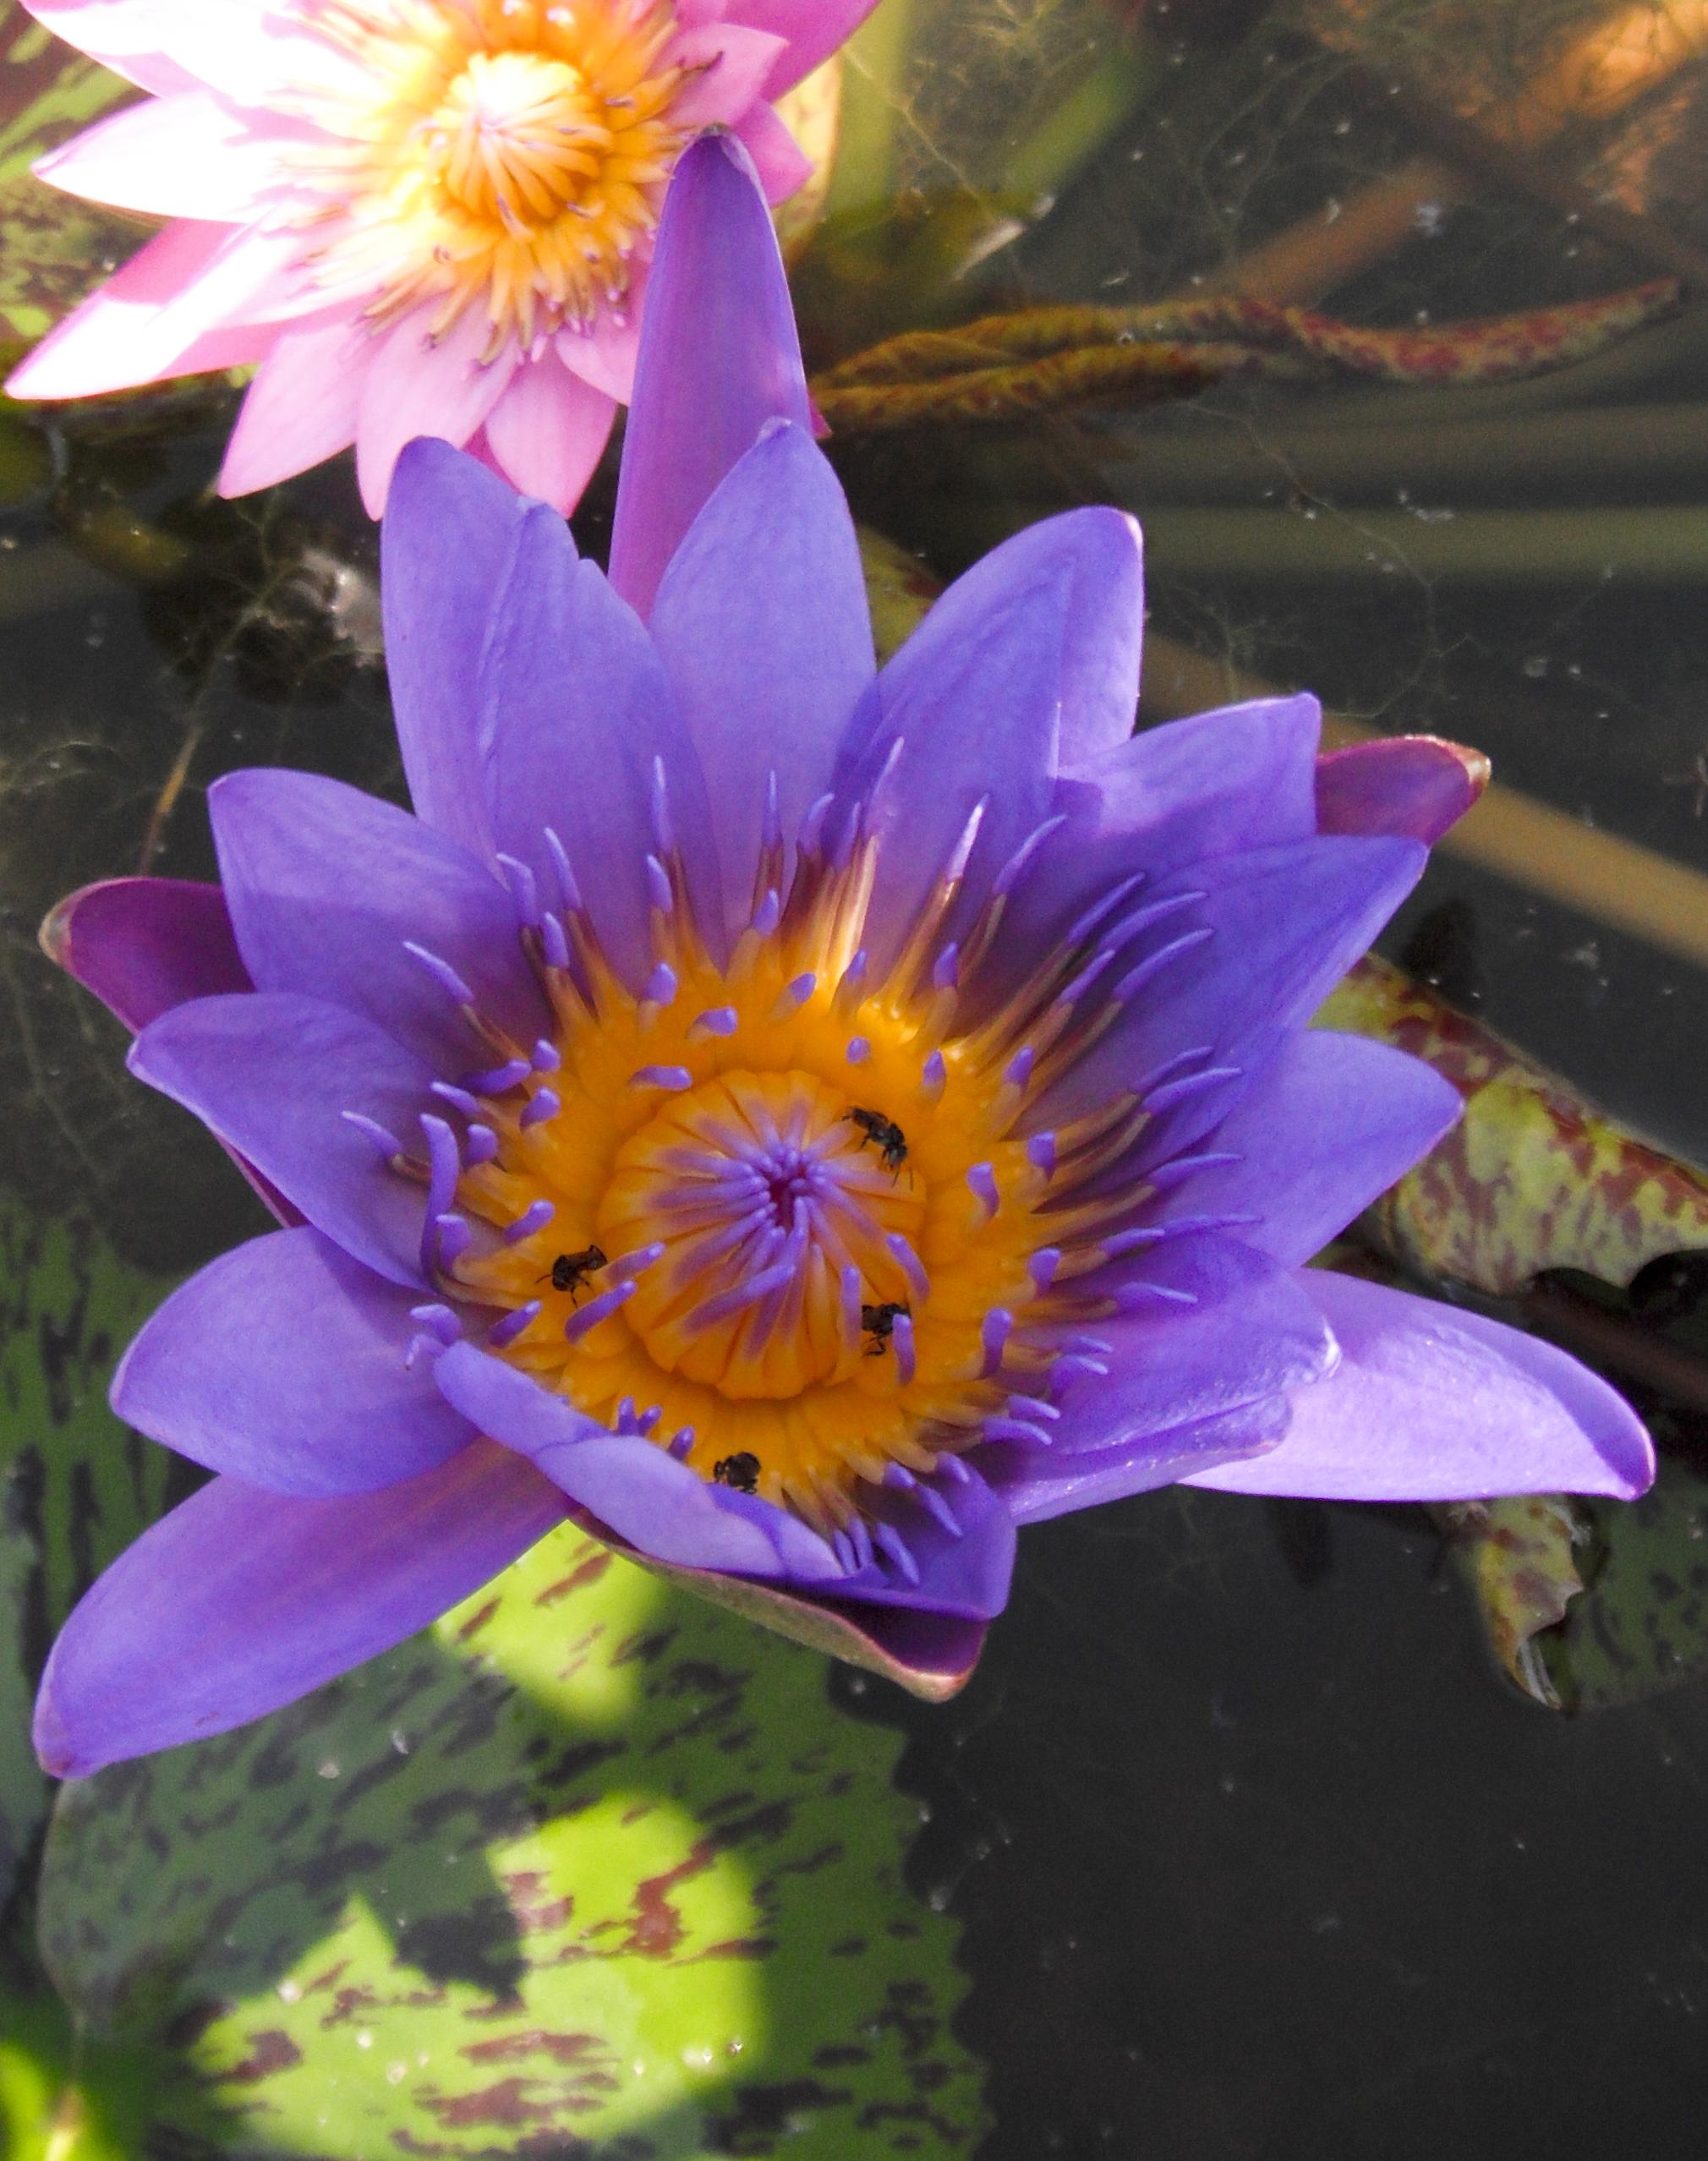 Free photo lotus flower purple orange lotus free download lotus flower purple orange lotus con2011 hq photo izmirmasajfo